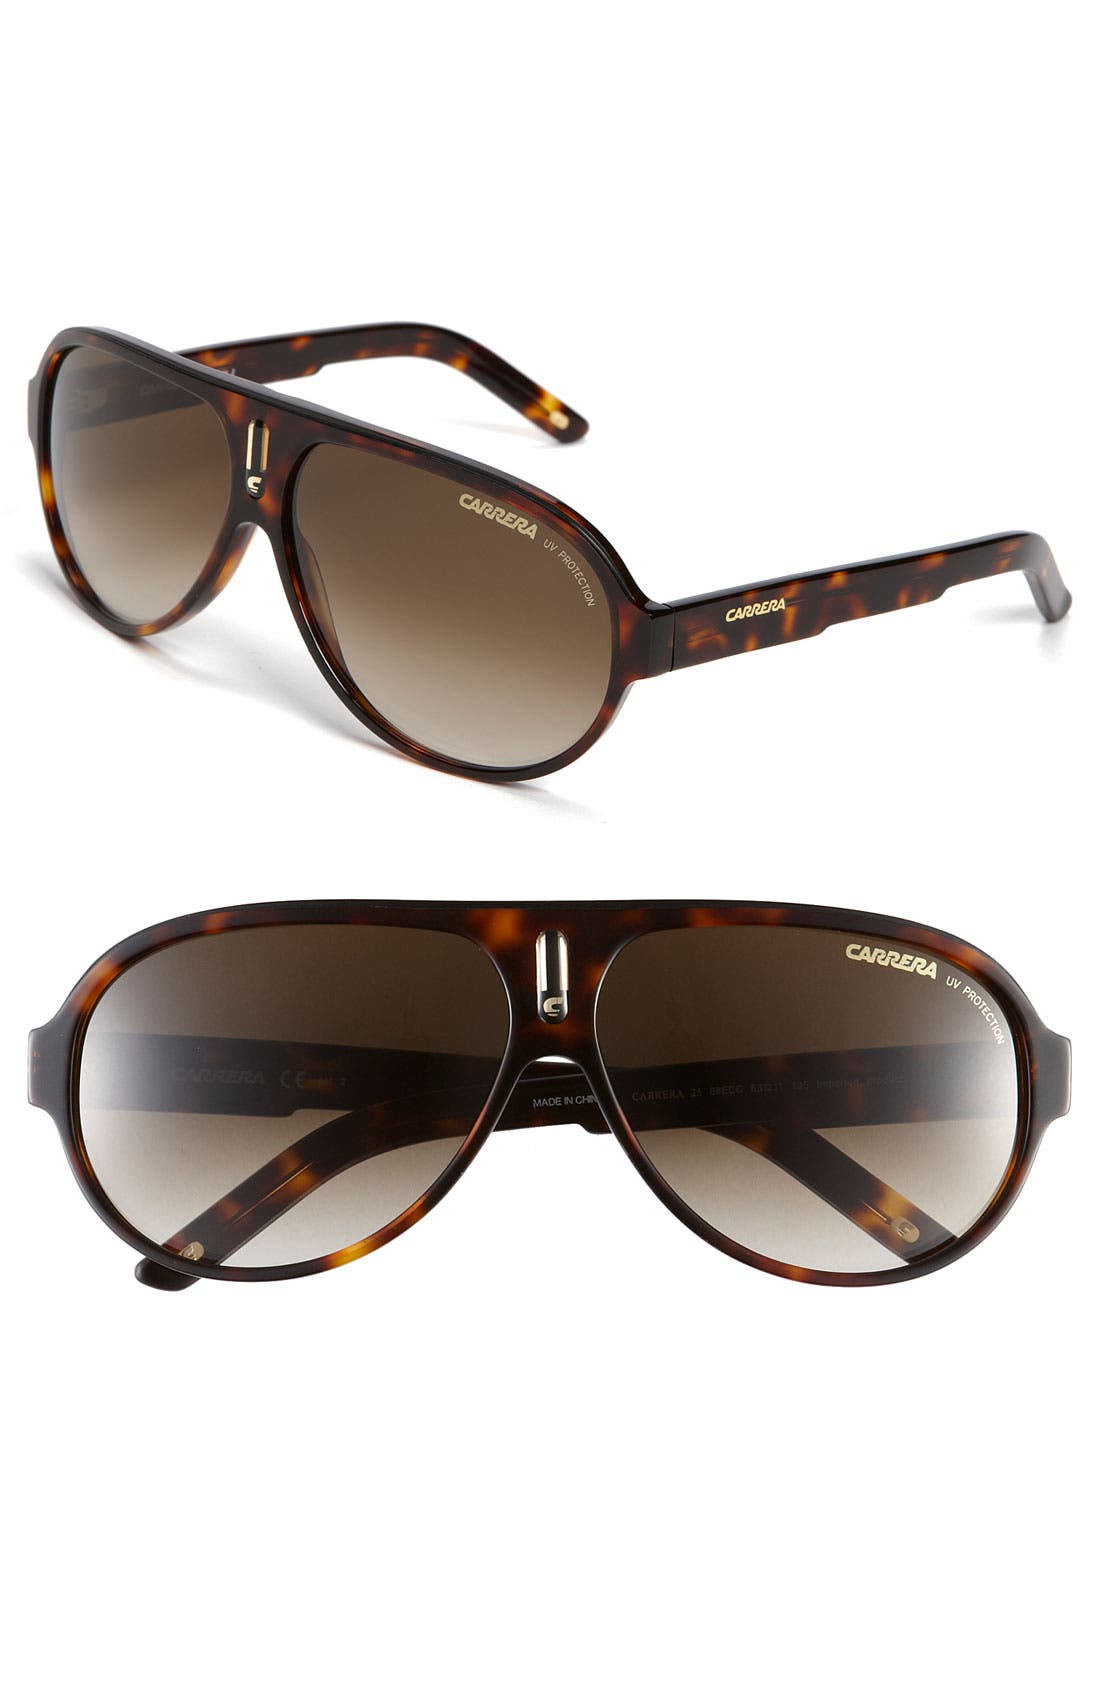 Main Image - Carrera Eyewear 63mm Aviator Sunglasses